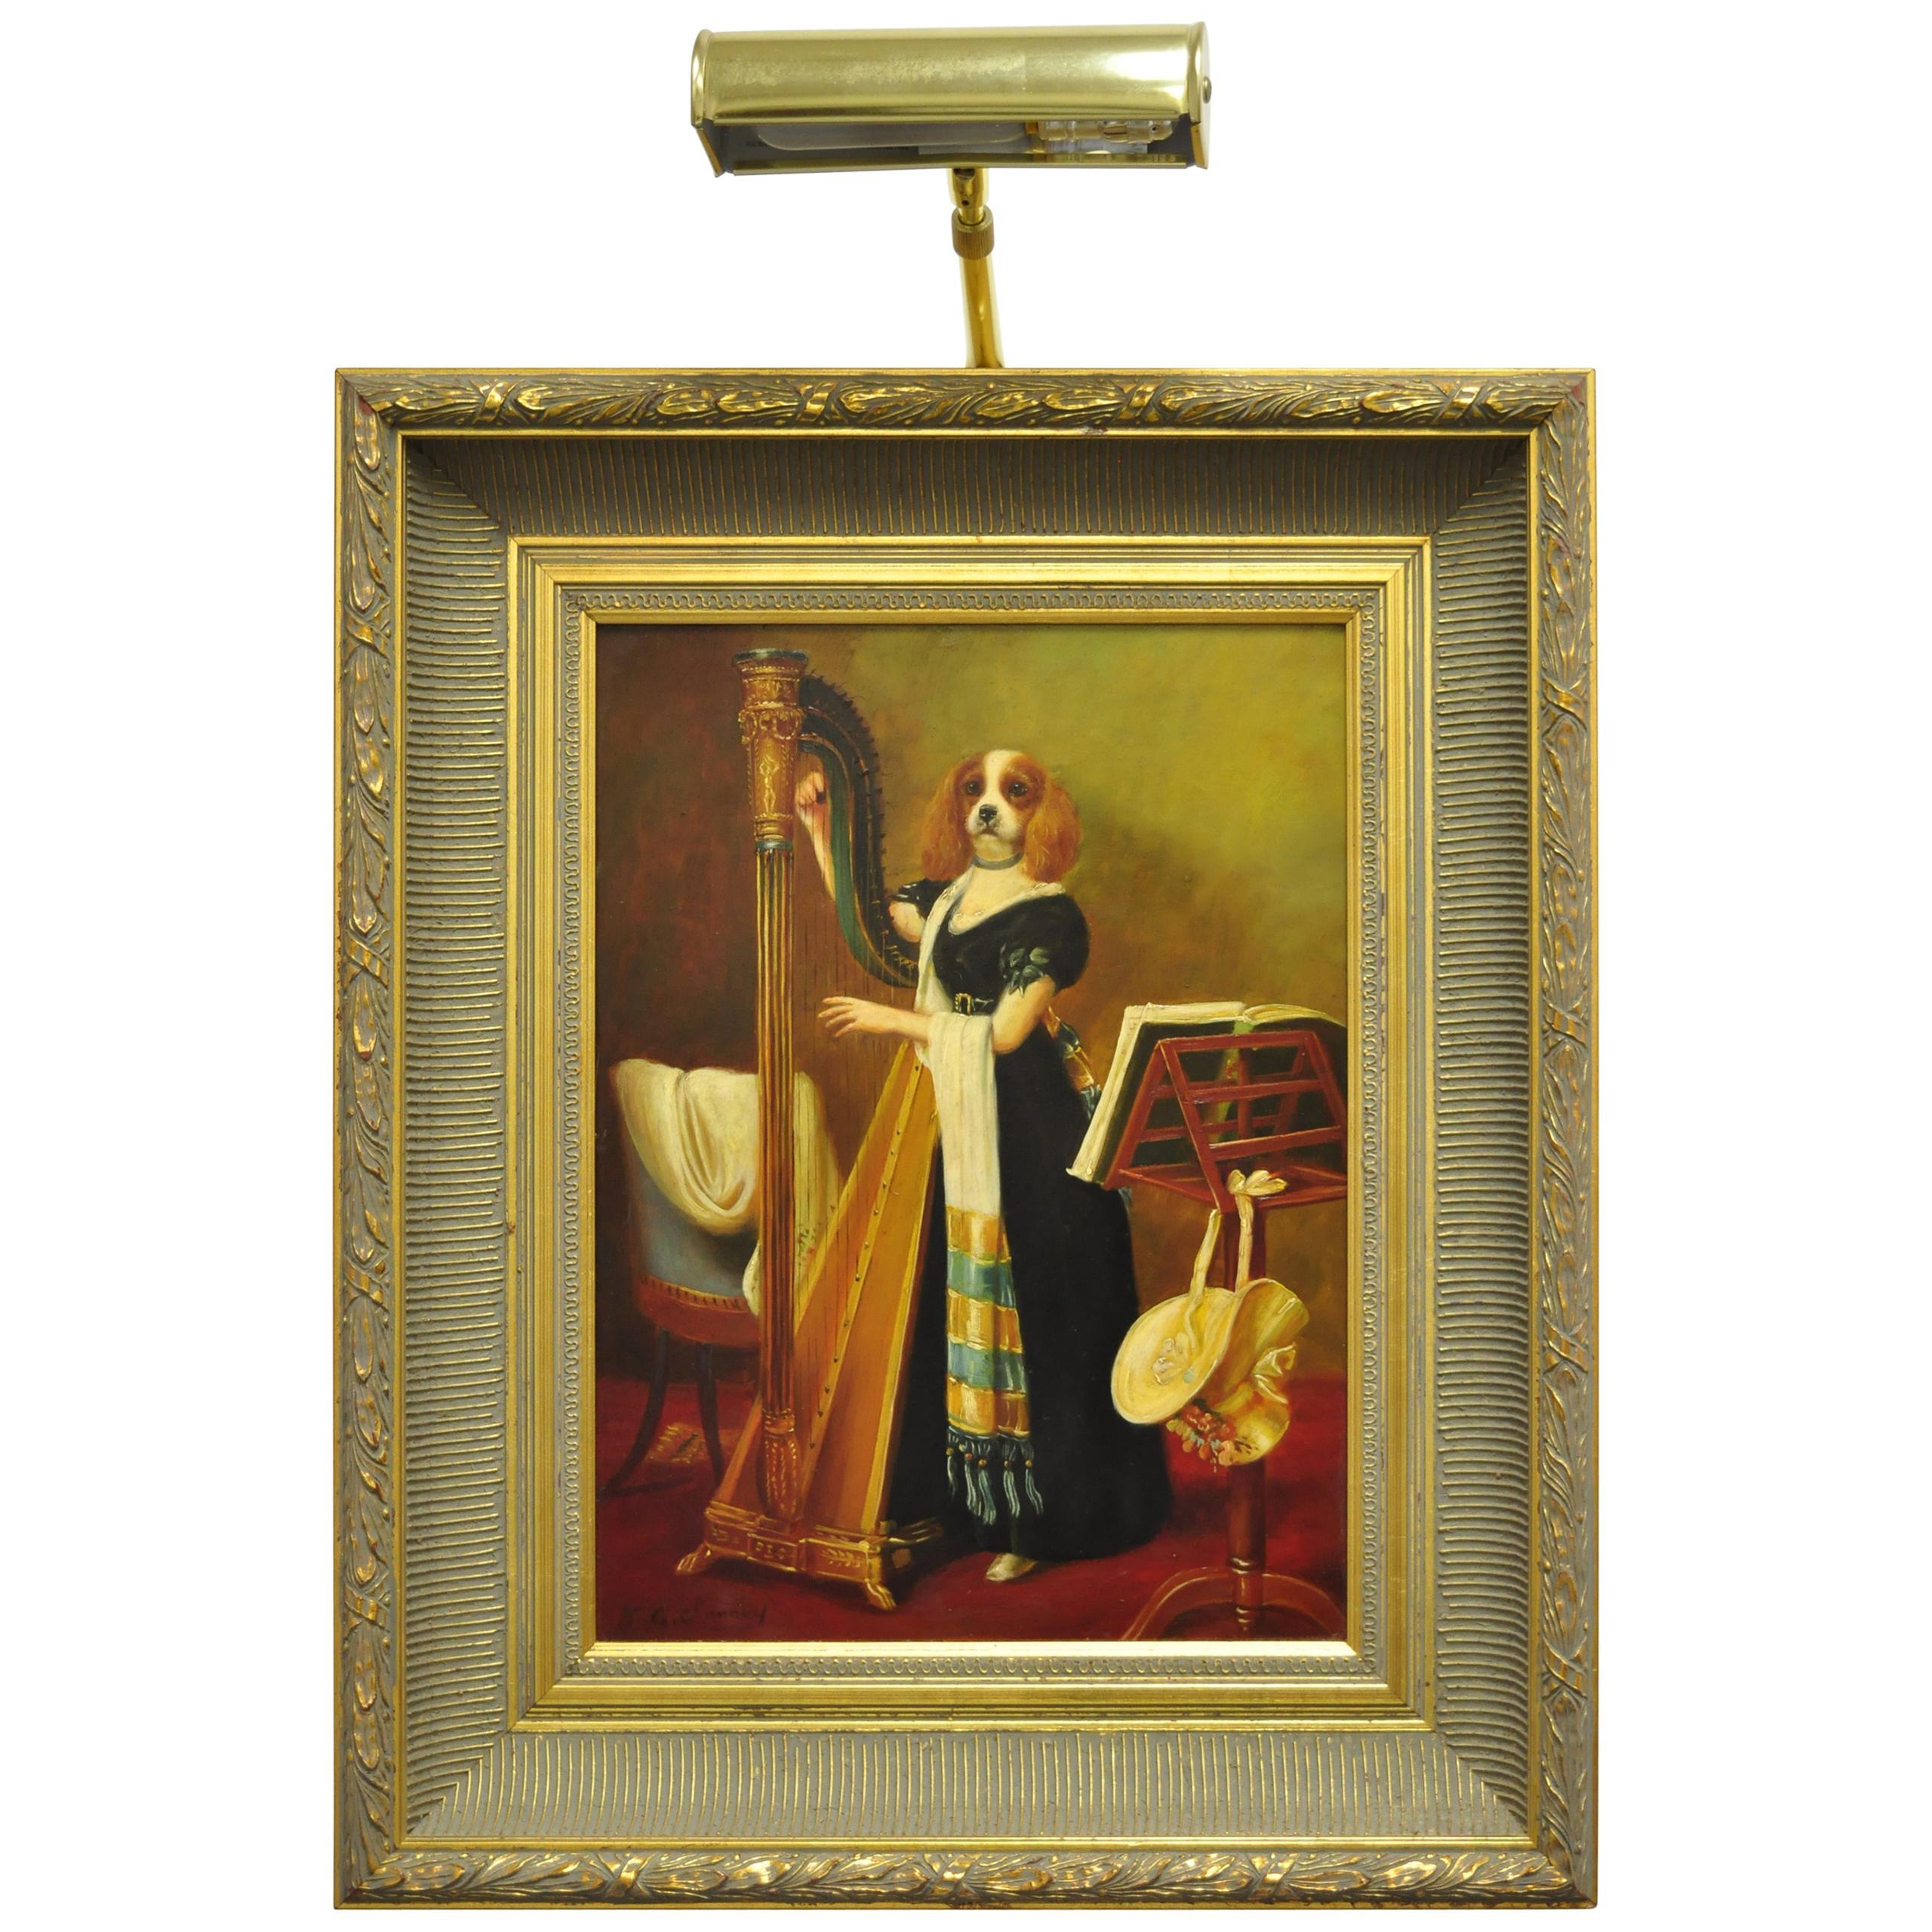 J.G. Clonney Signed Oil on Board Portrait Royal Dog Spaniel Painting Gold Frame